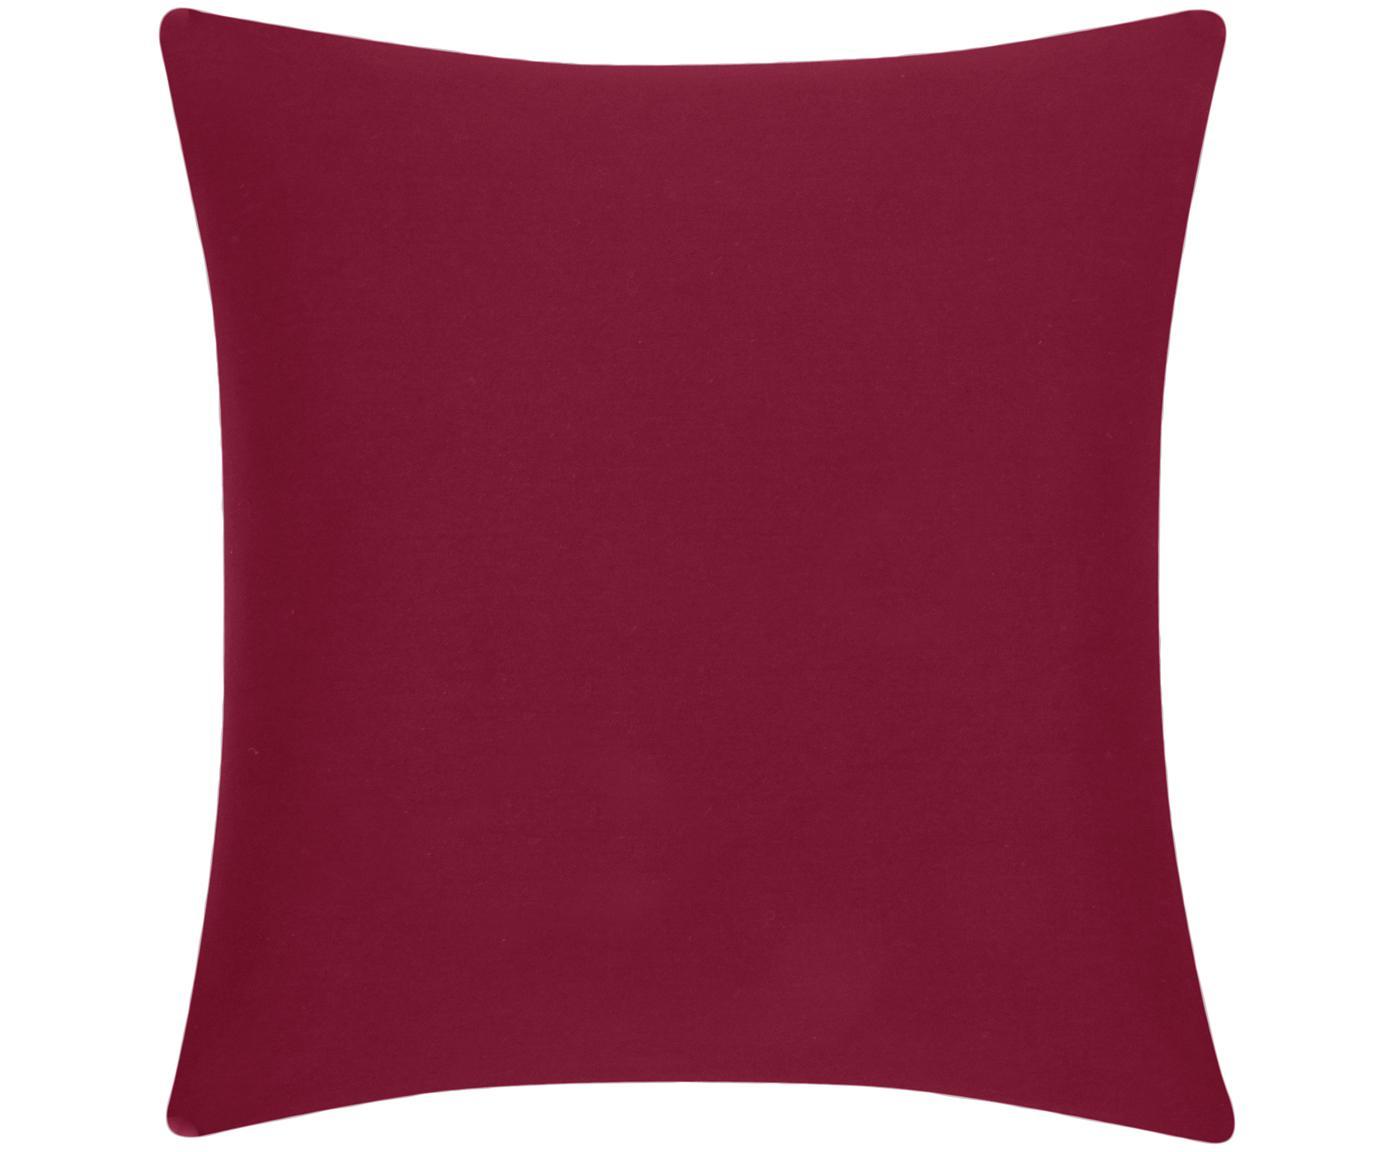 Baumwoll-Kissenhülle Mads in Rot, 100% Baumwolle, Rot, 40 x 40 cm